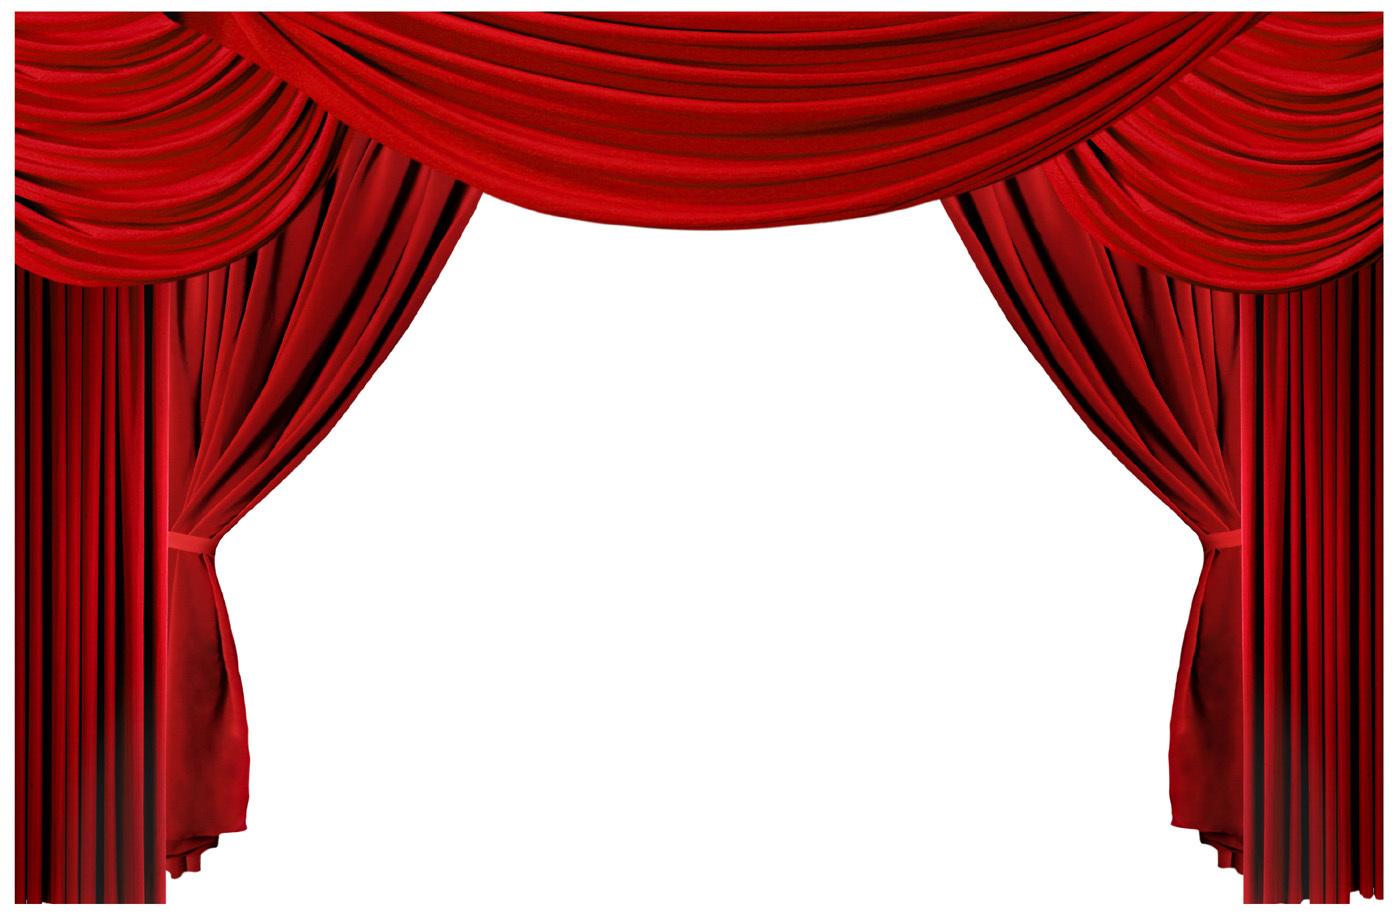 Toneel clipart jpg library Free Theater Award Cliparts, Download Free Clip Art, Free ... jpg library